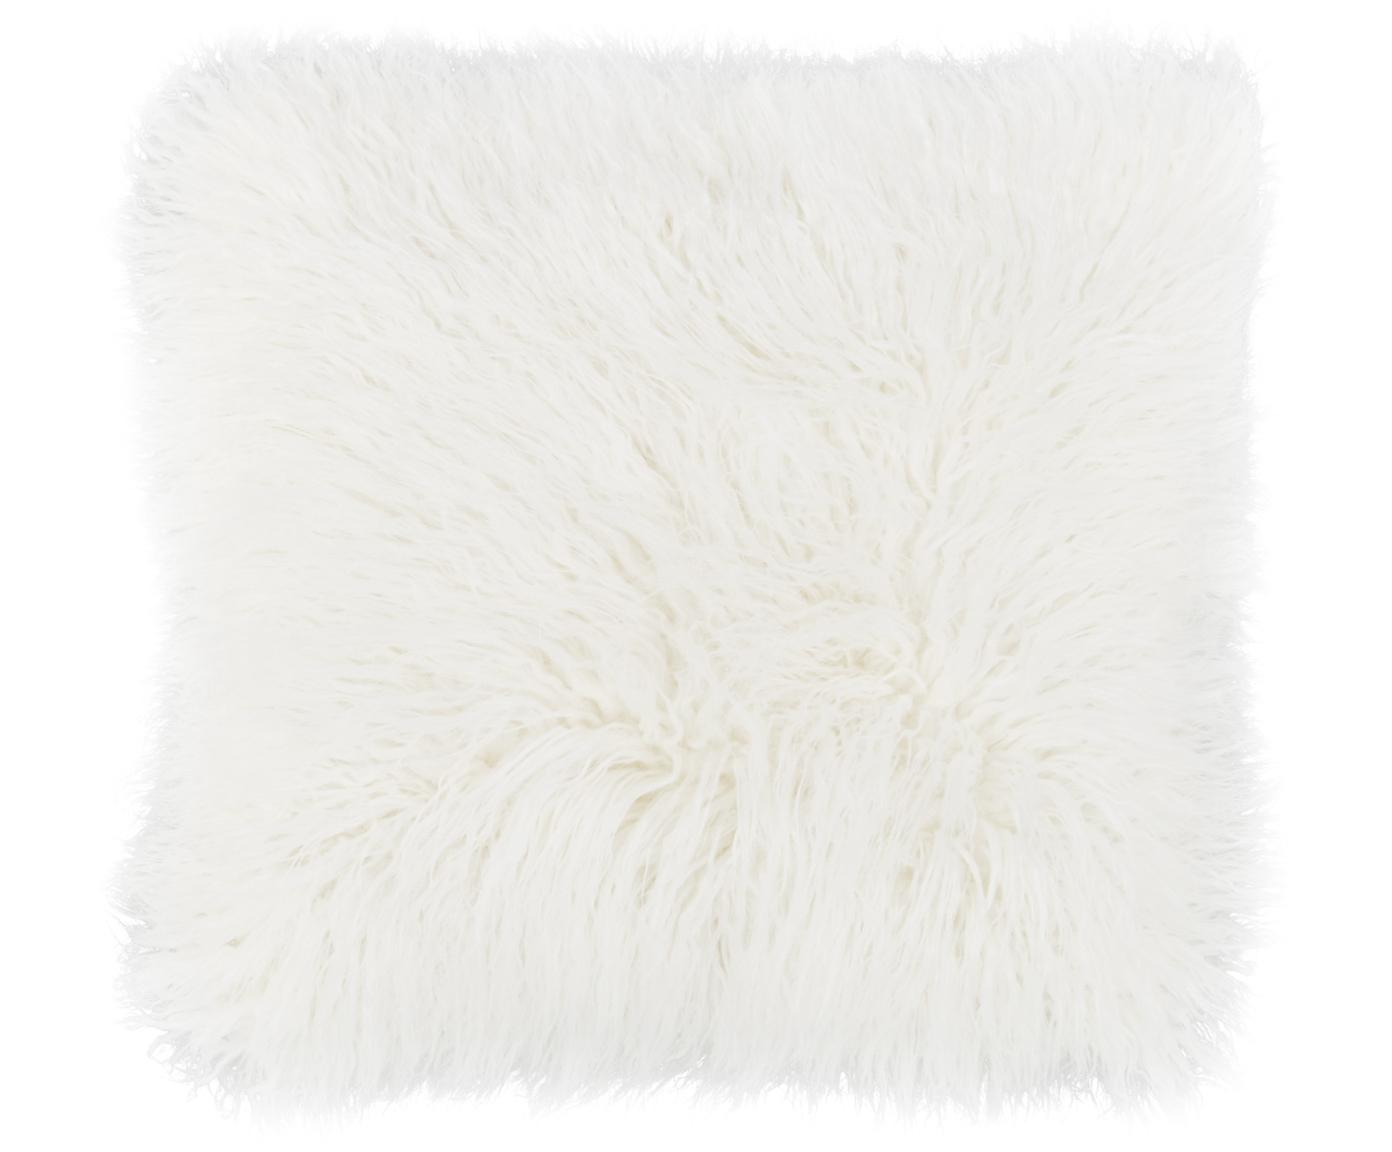 Poszewka na poduszkę ze sztucznego futra Morten, Kremowy, S 40 x D 40 cm